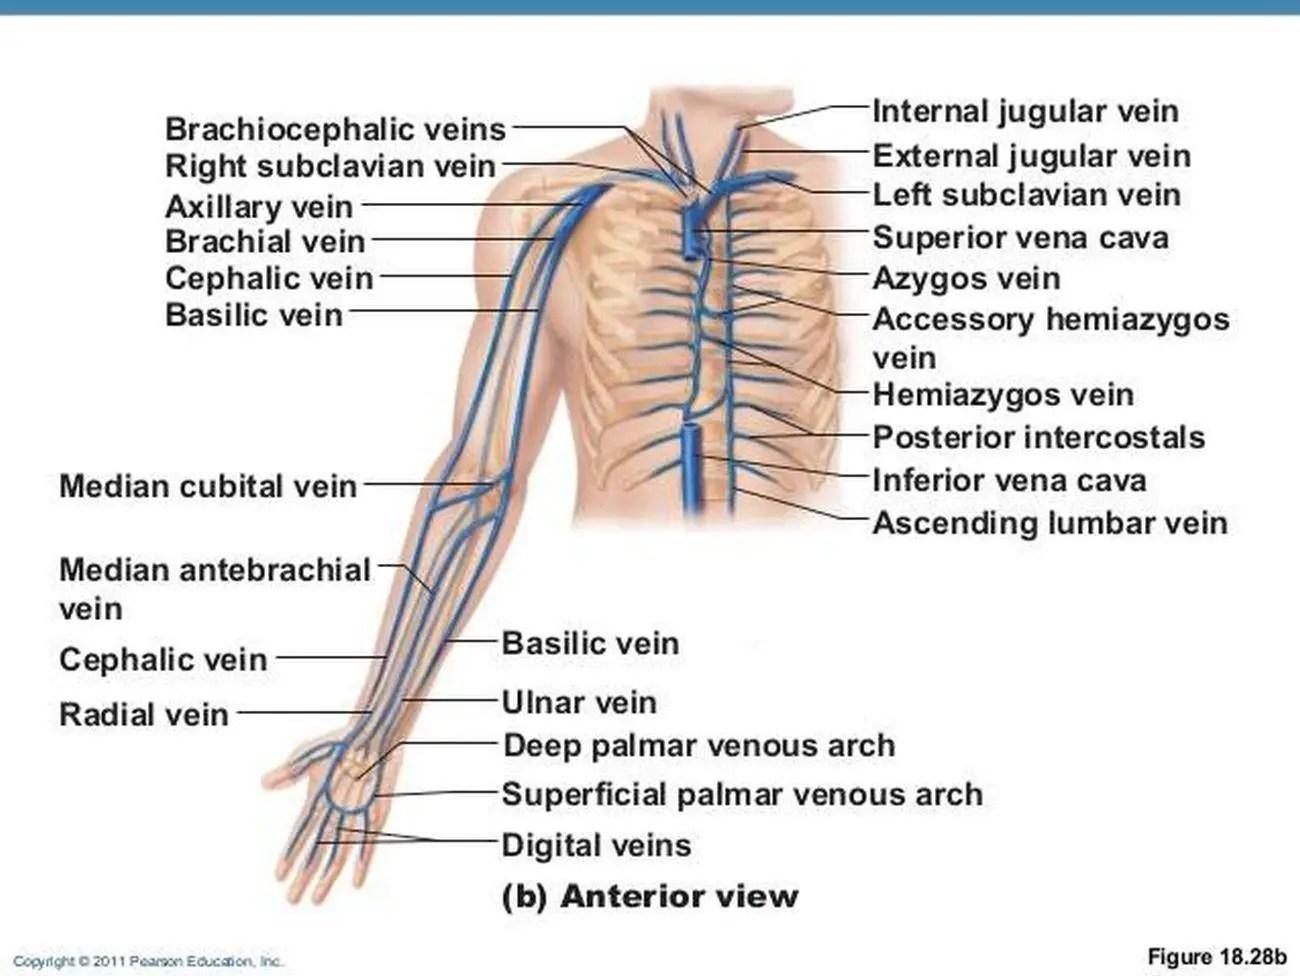 antecubital fossa diagram combination switch wiring pictures of brachial vein